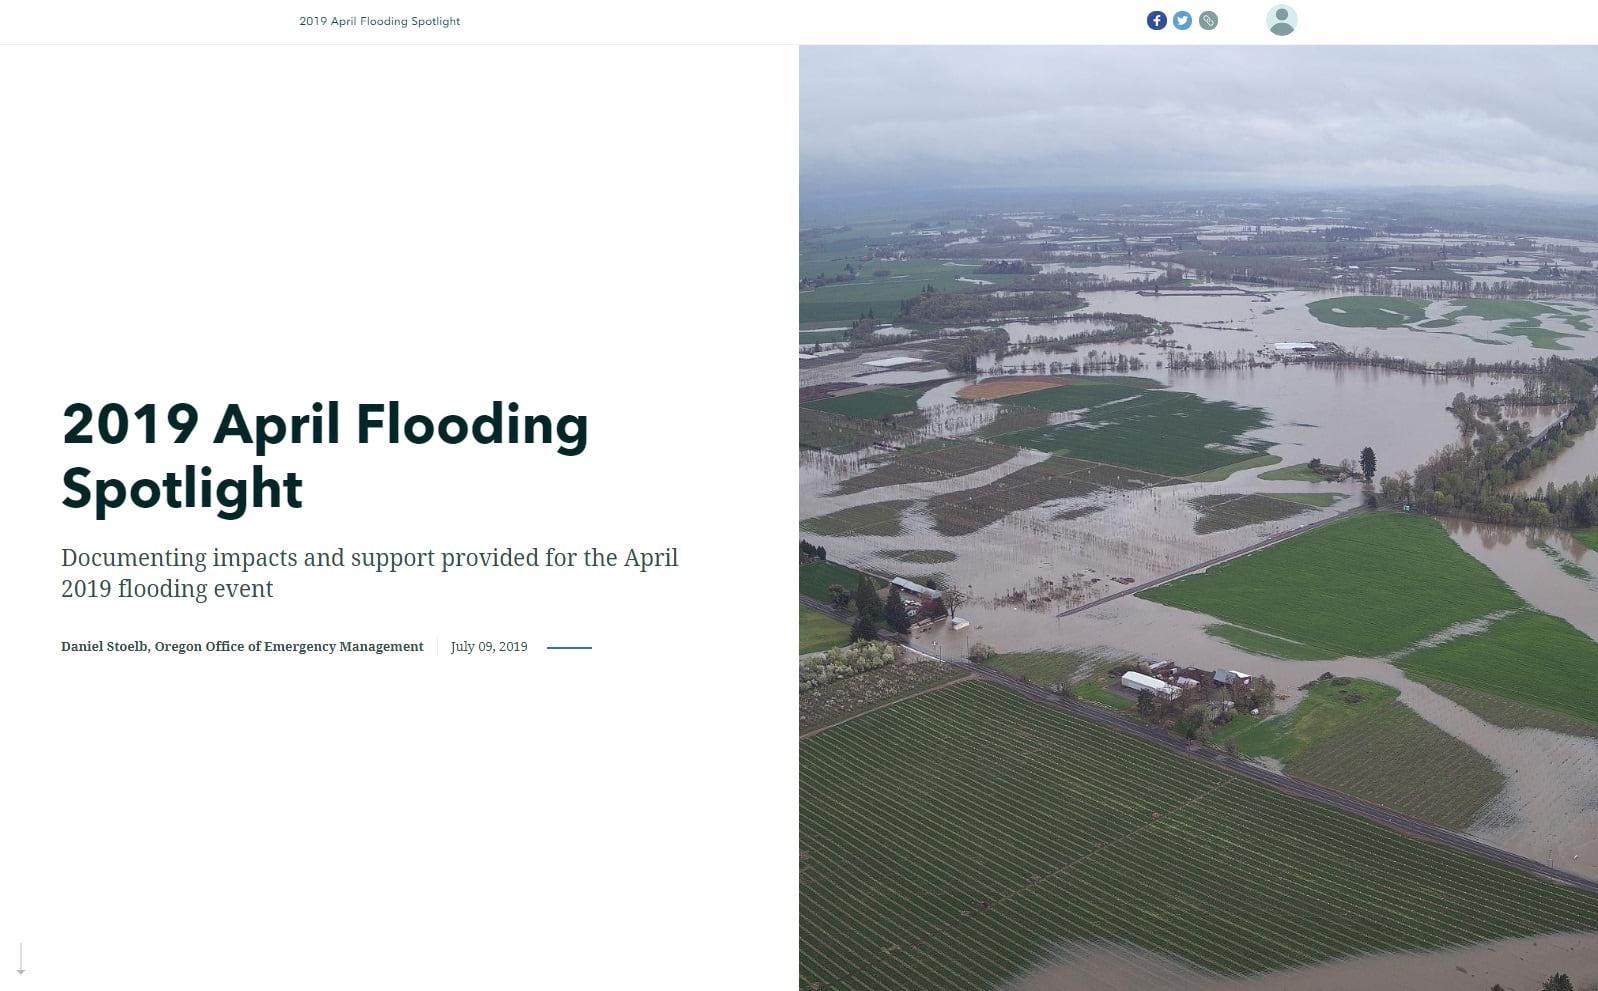 2019 April Flooding Spotlight